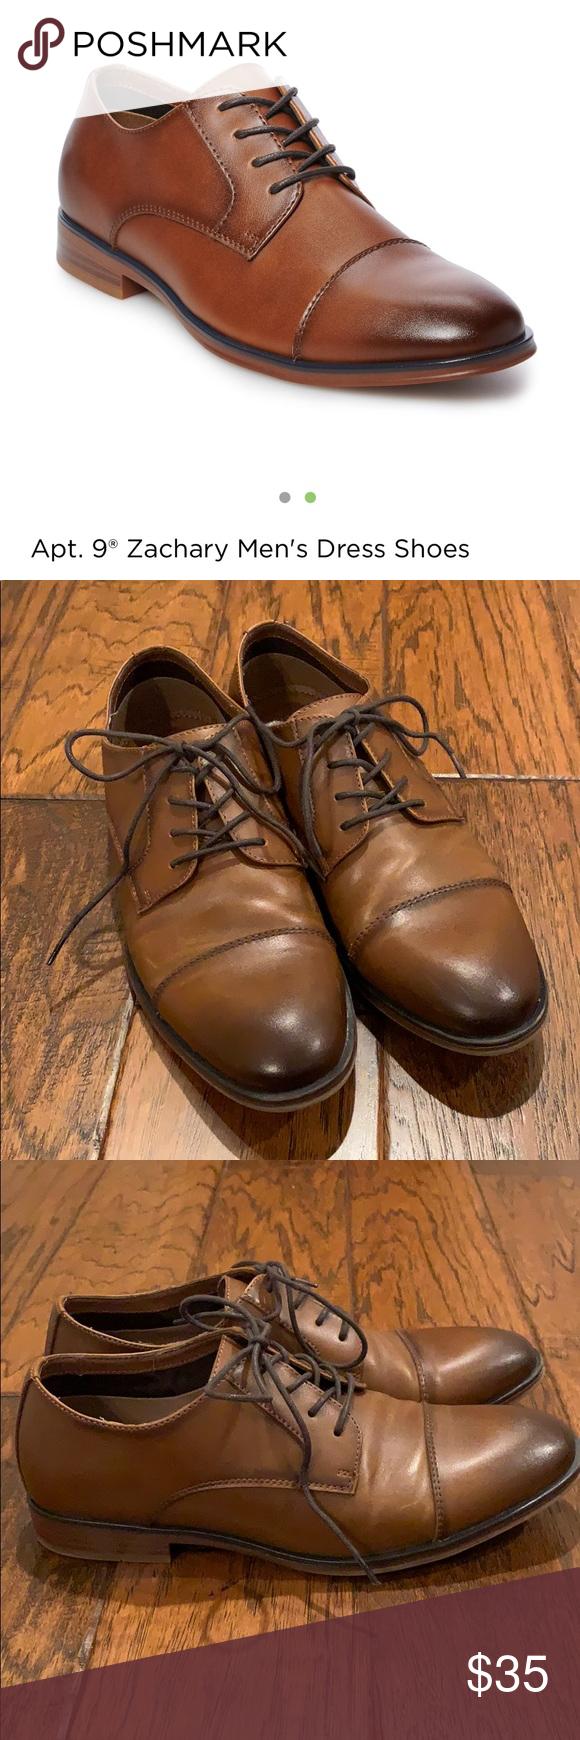 apt 9 zachary men's dress shoes